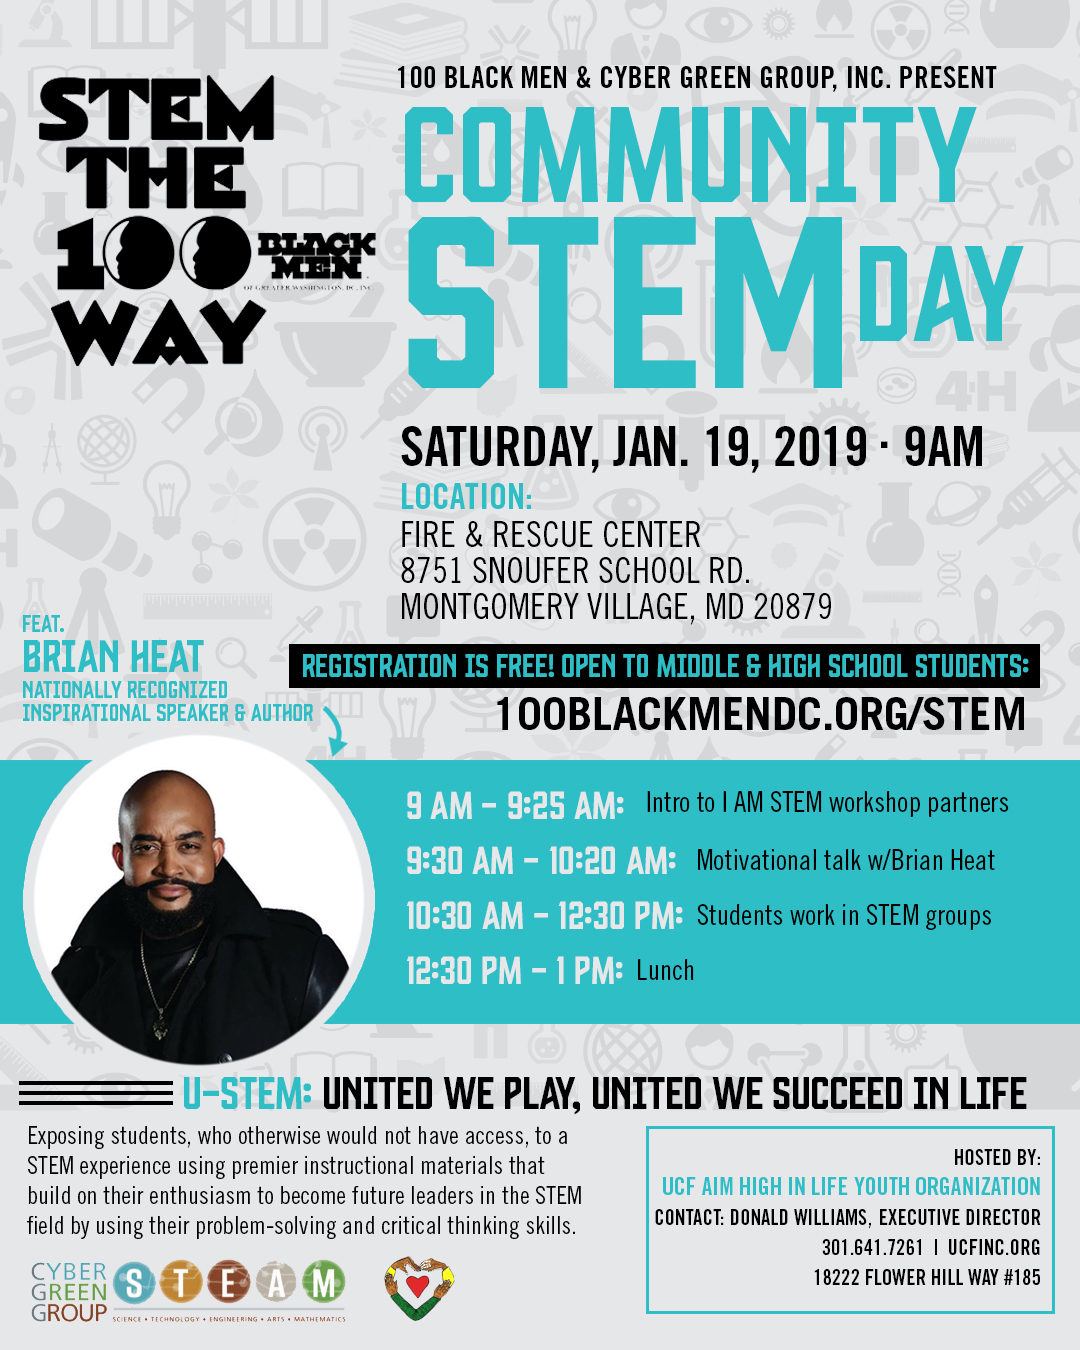 Flyer for Community STEM Day